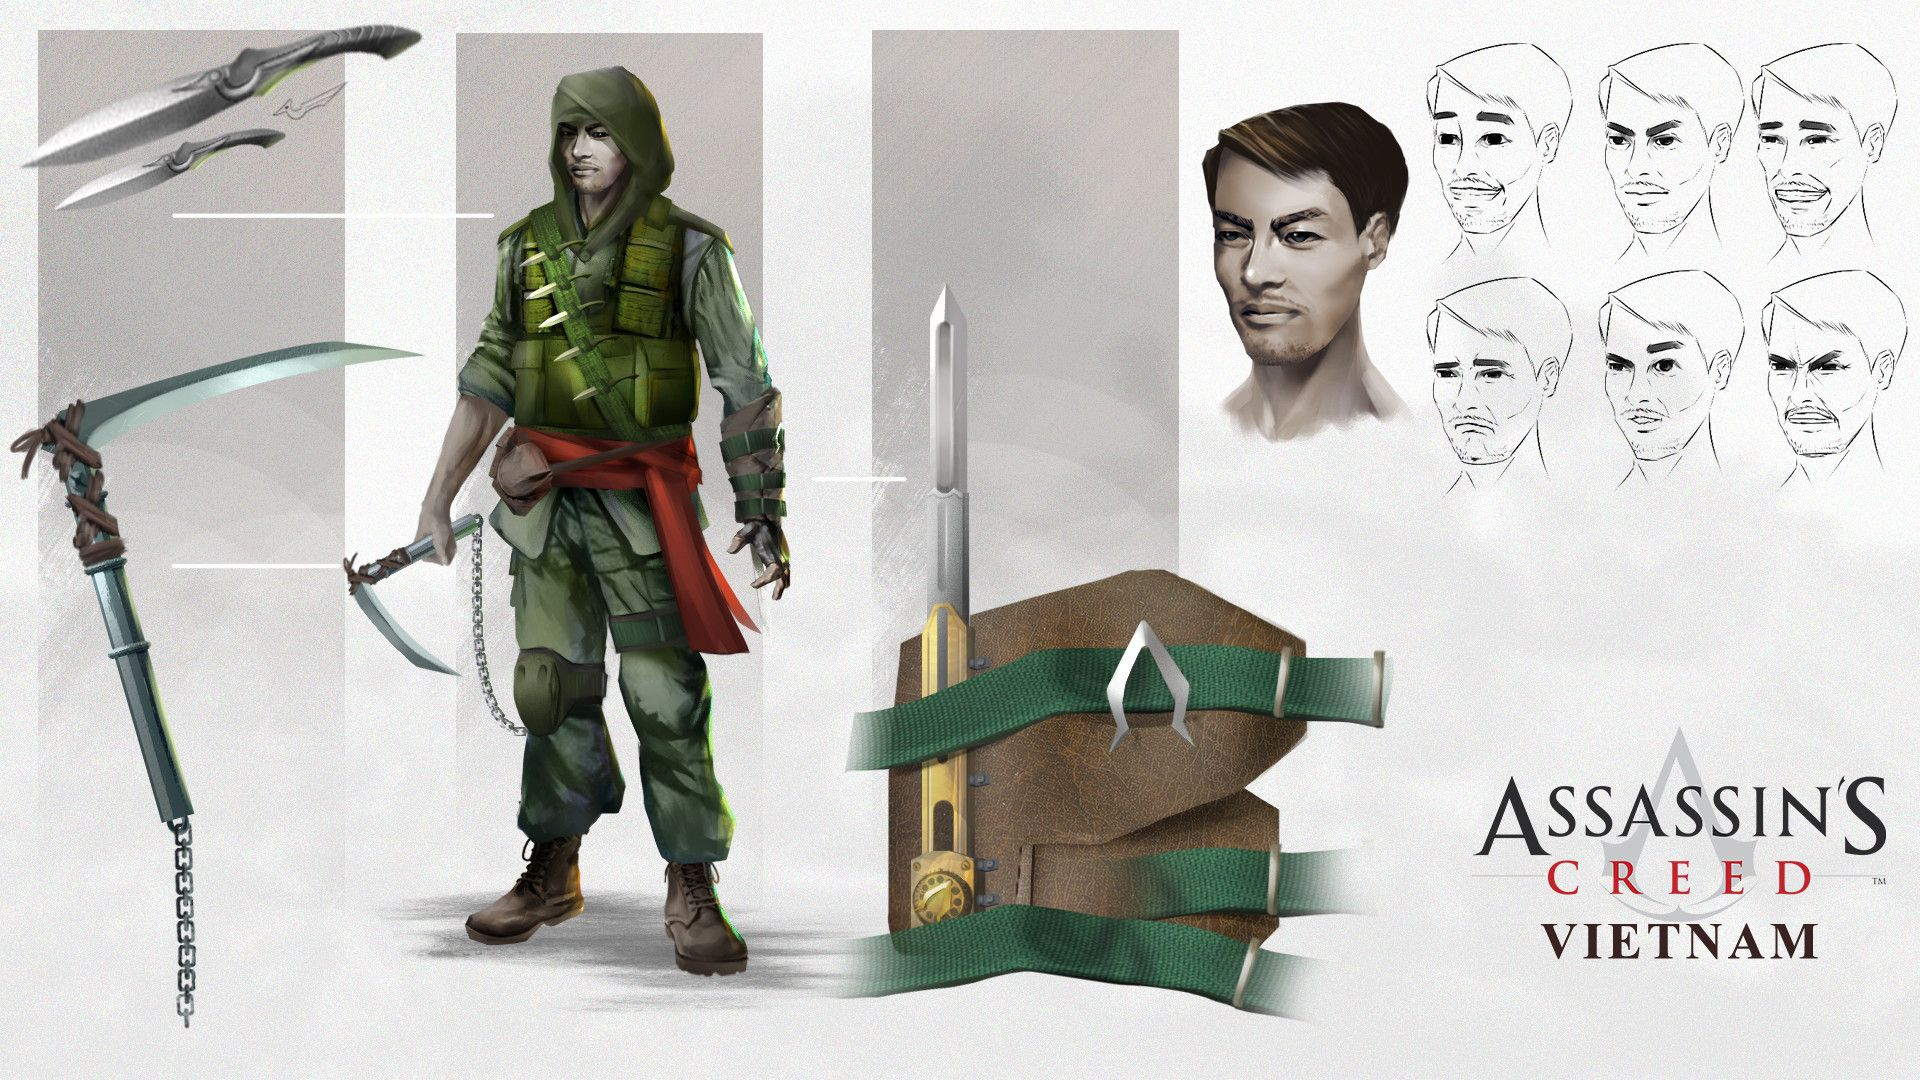 Assassin S Creed Vietnam Fan Concept Nghệ Thuật